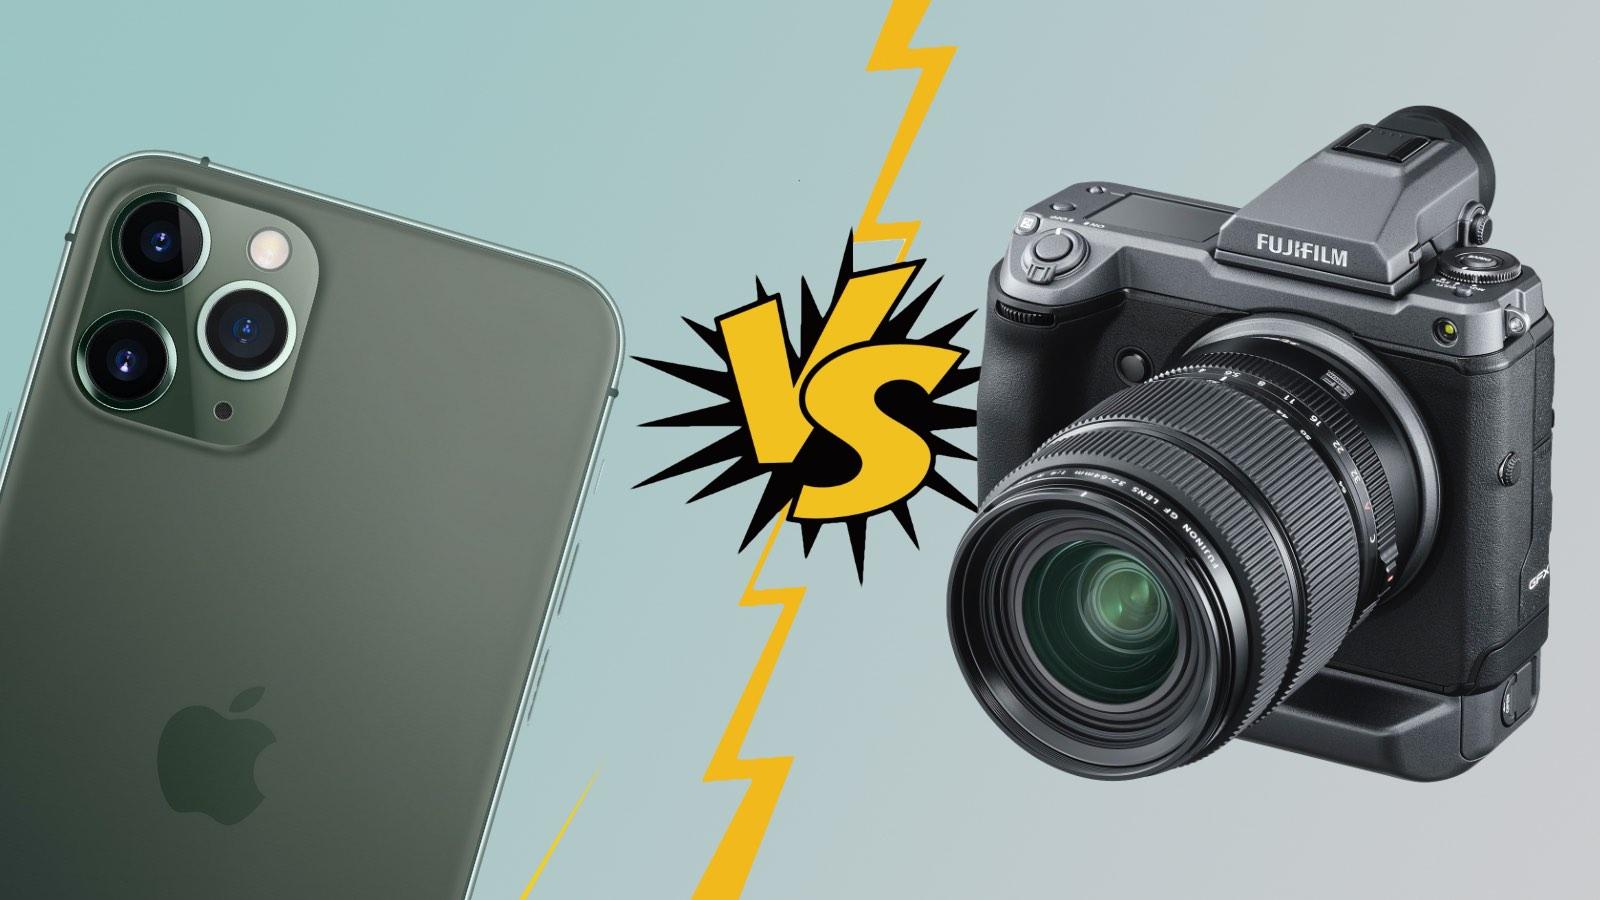 iphone-11-pro-vs-fujifilm-front